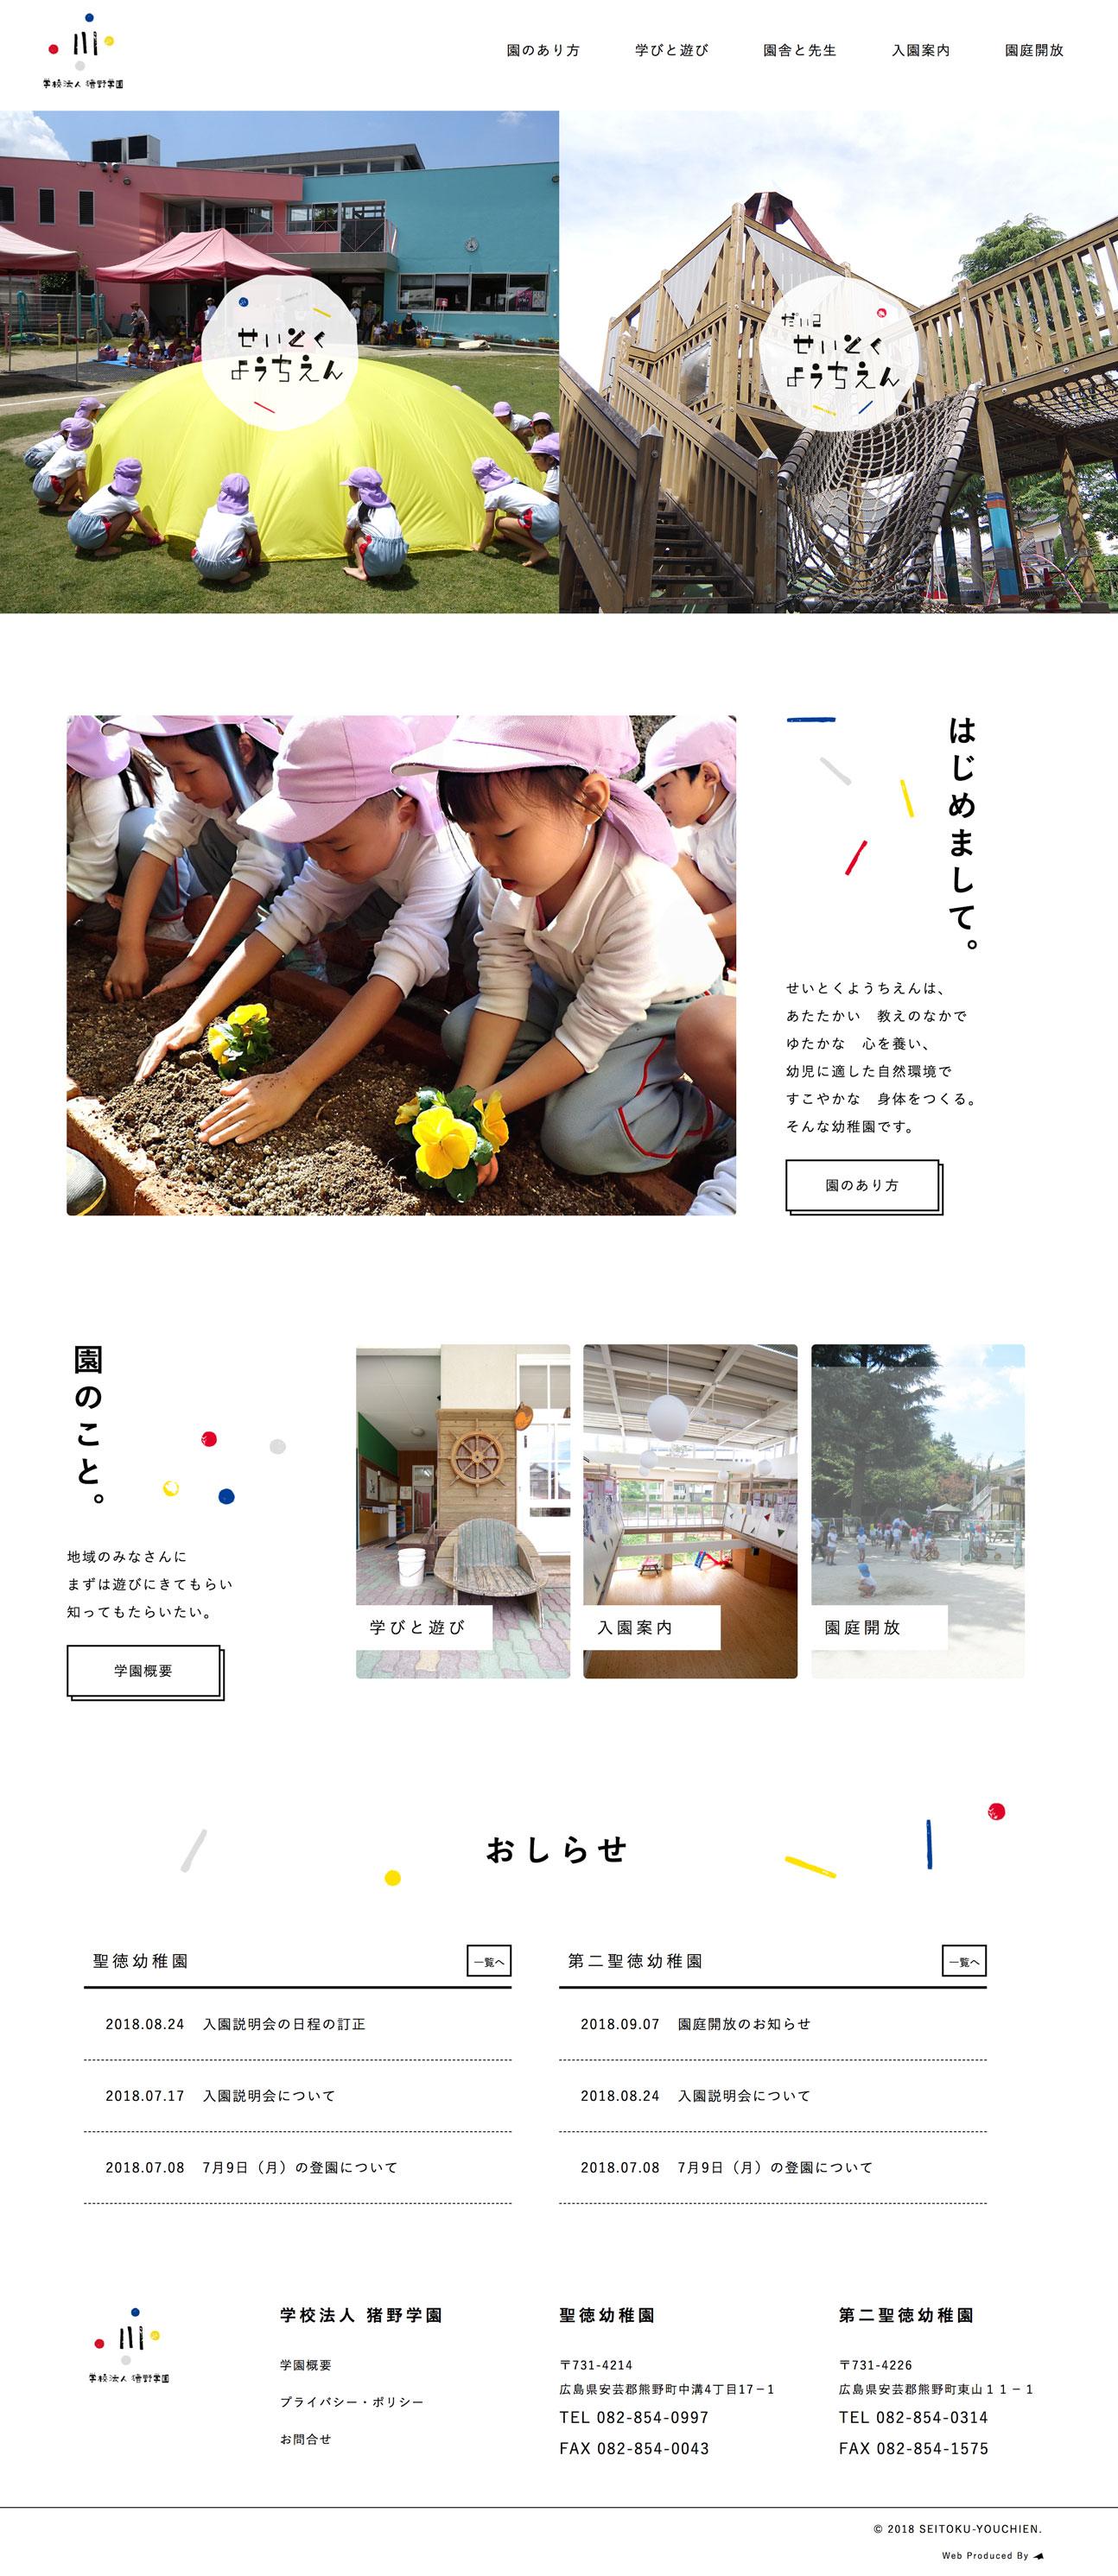 WEBサイトTOPデザイン/学校法人 猪野学園様制作事例